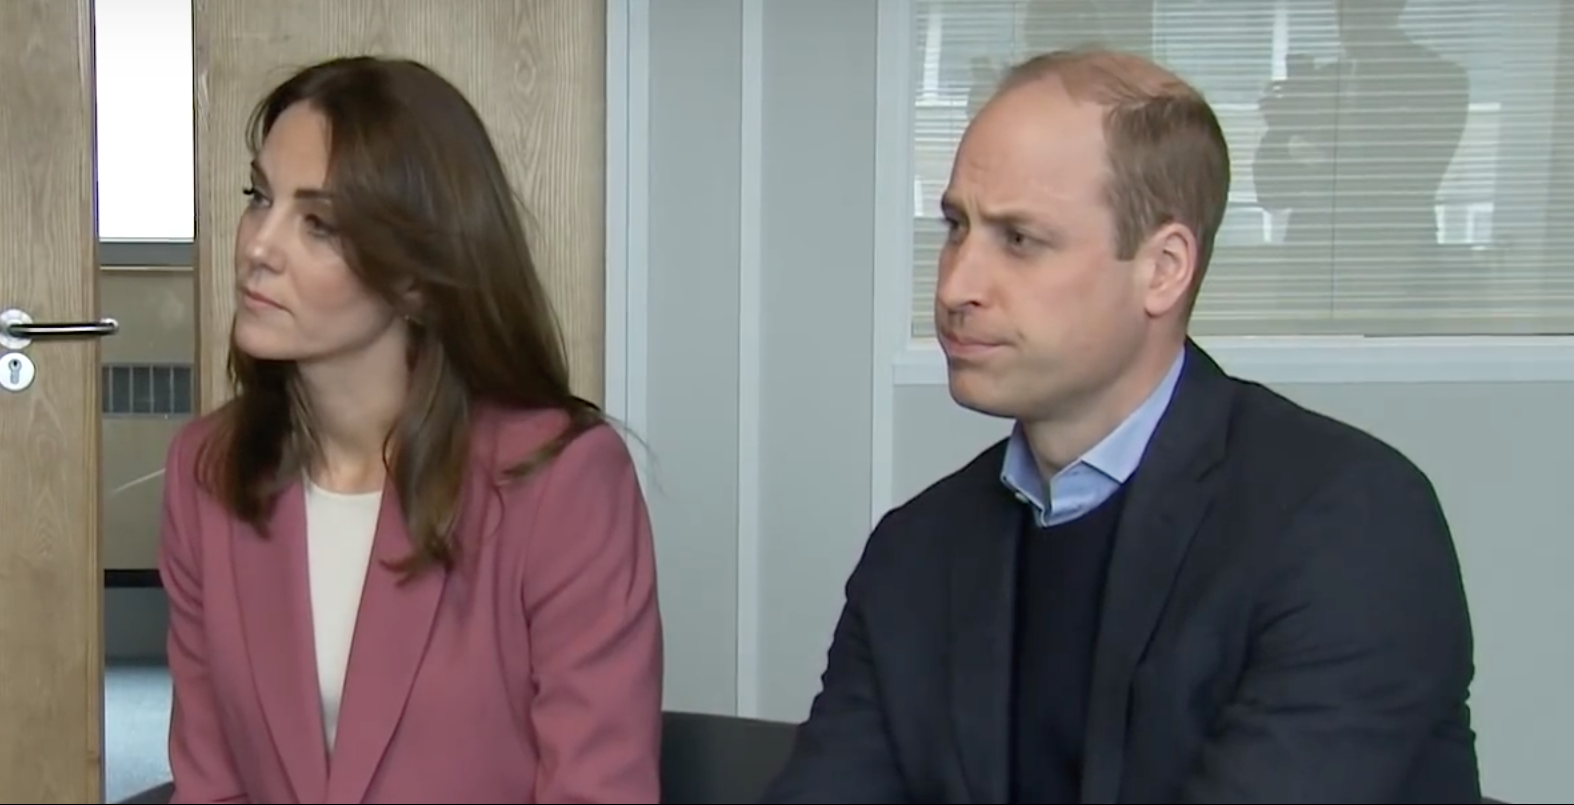 Coronavirus: Duke and Duchess of Cambridge praise NHS staff as they make surprise visit to 111 call centre